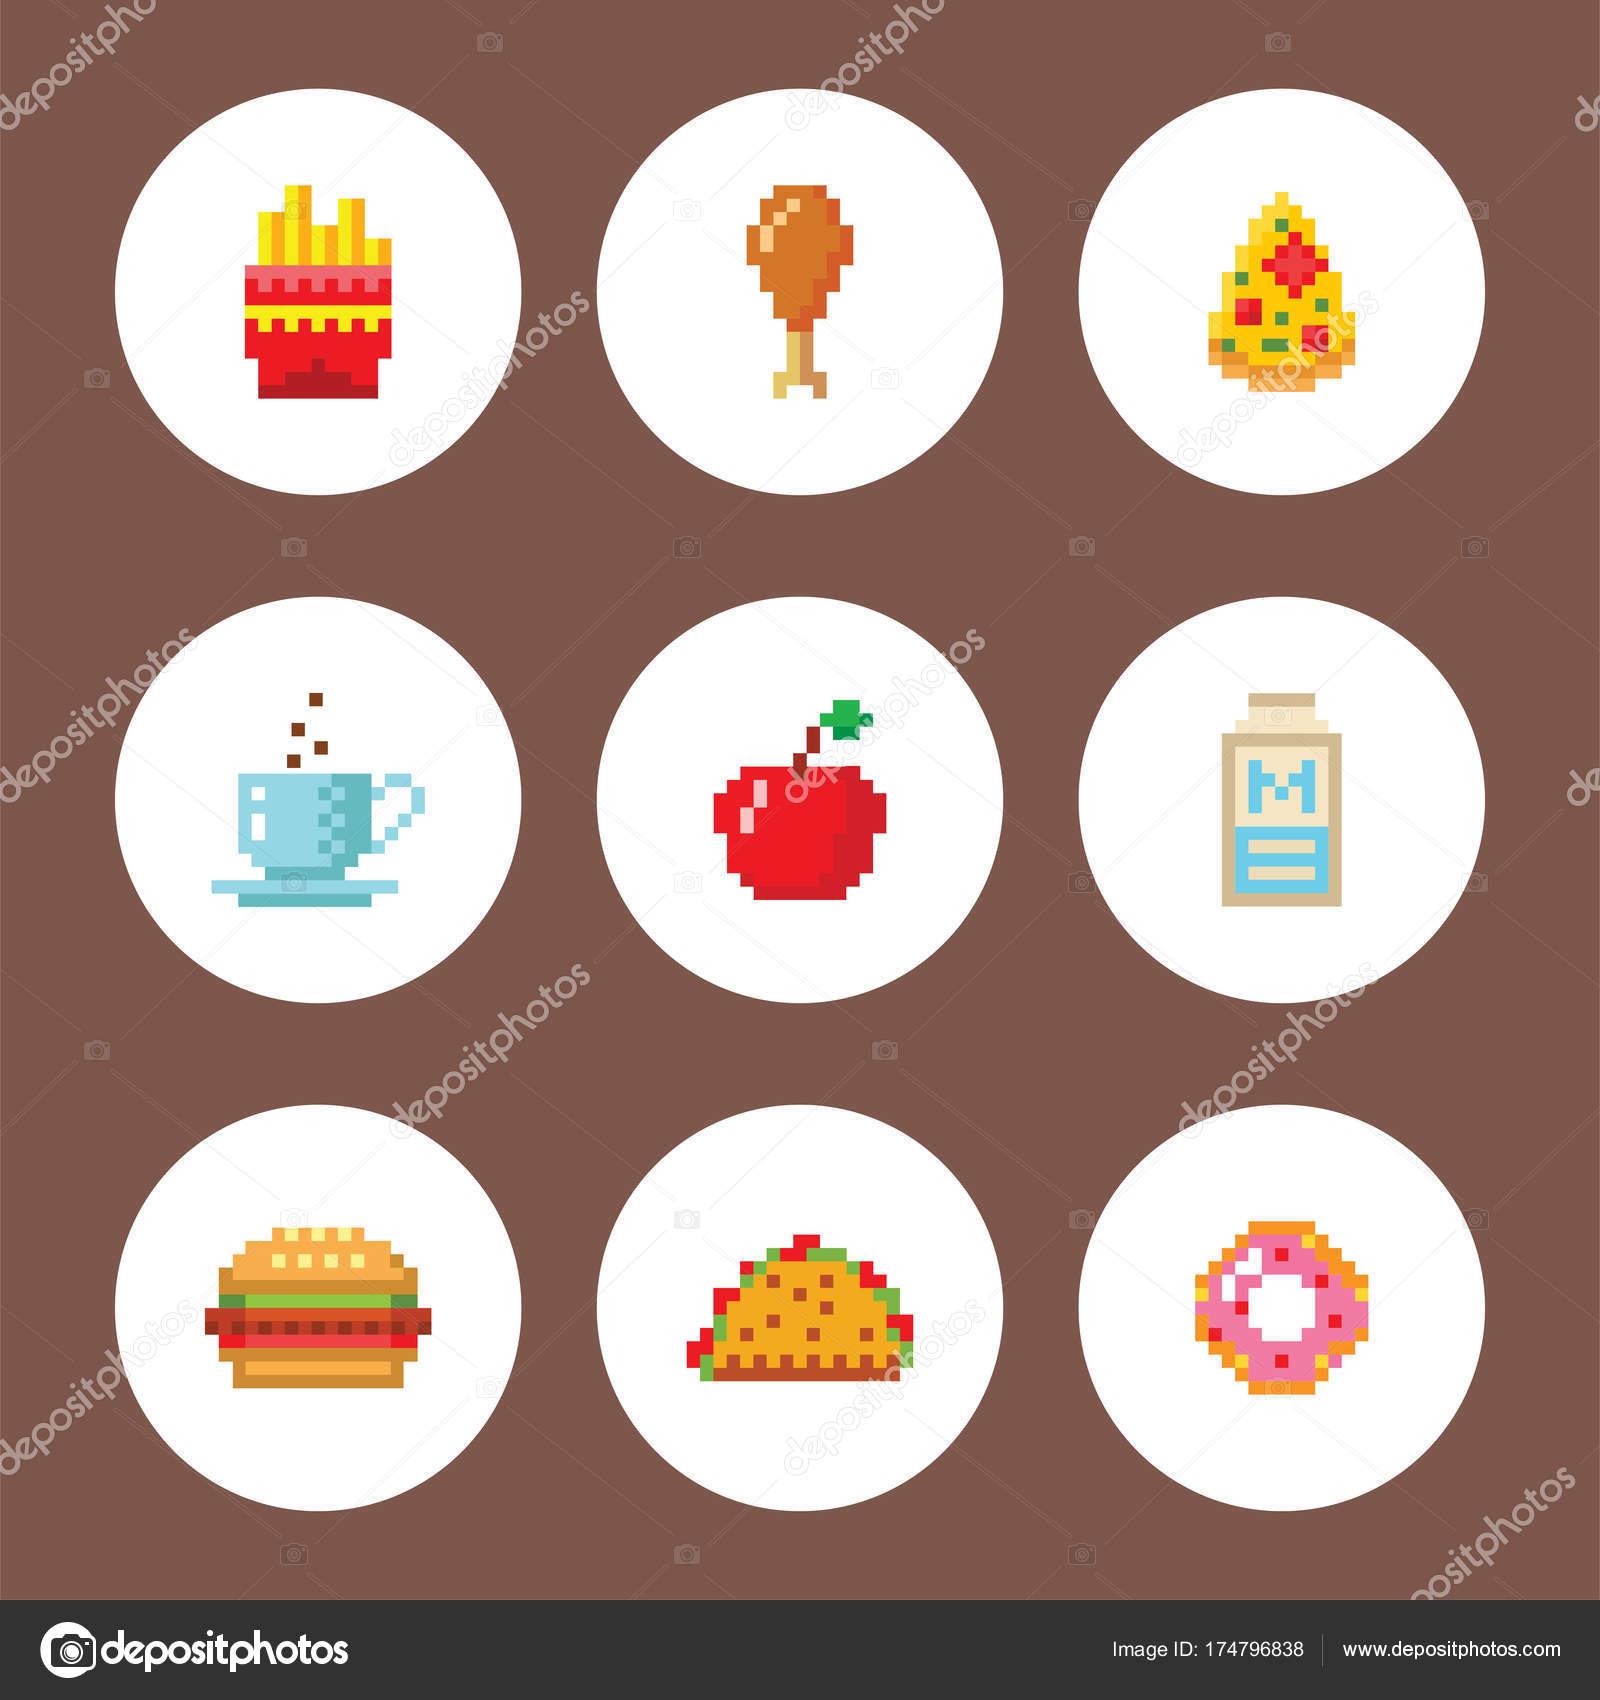 Pixel Art Food Computer Design Icons Vector Illustration